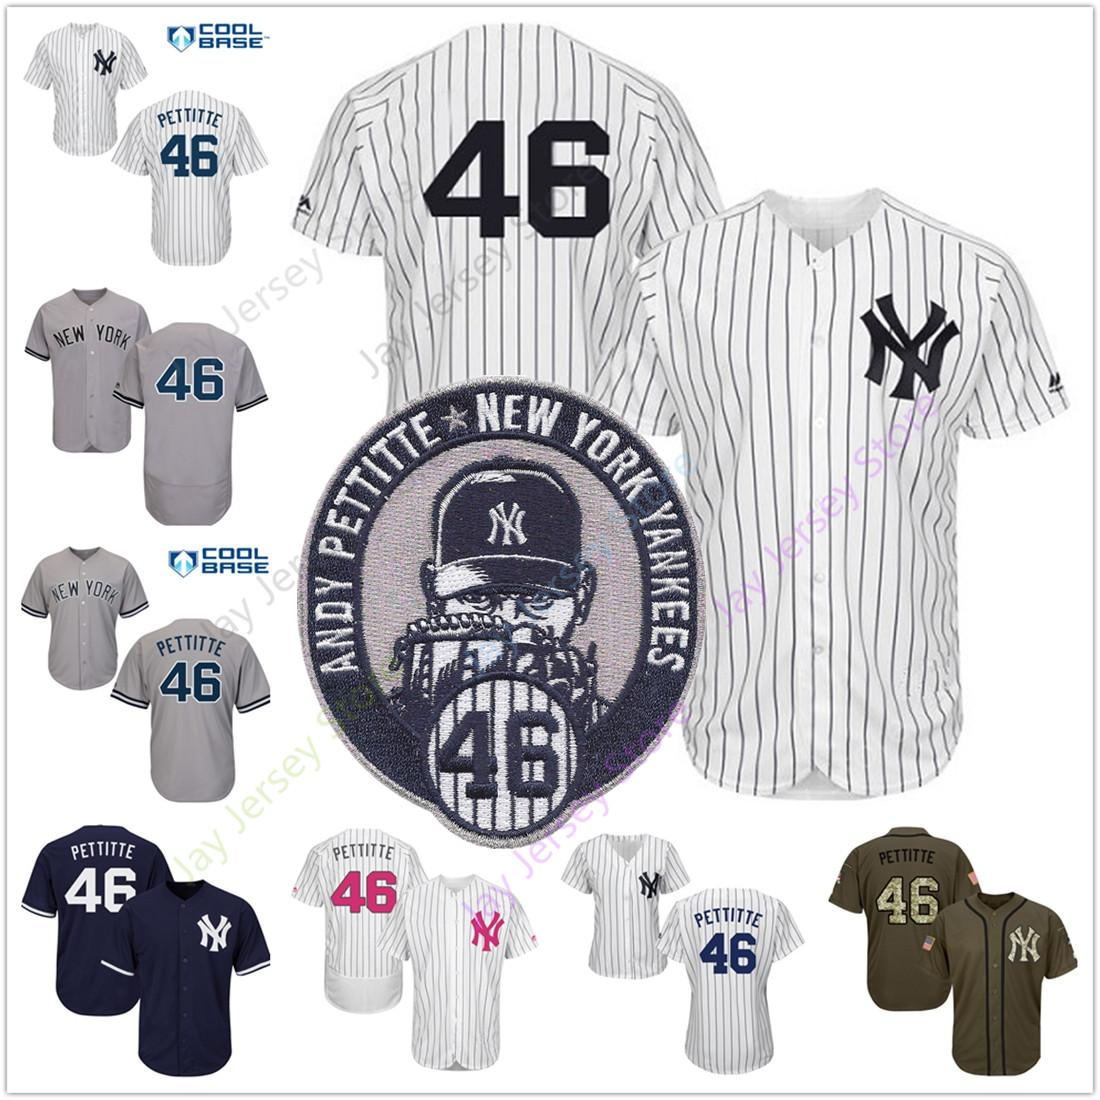 premium selection ace0d da550 Custom Andy Pettitte Yankees Jersey New York Home Away White Pinstripe Grey  Men Women Youth Size S-3XL